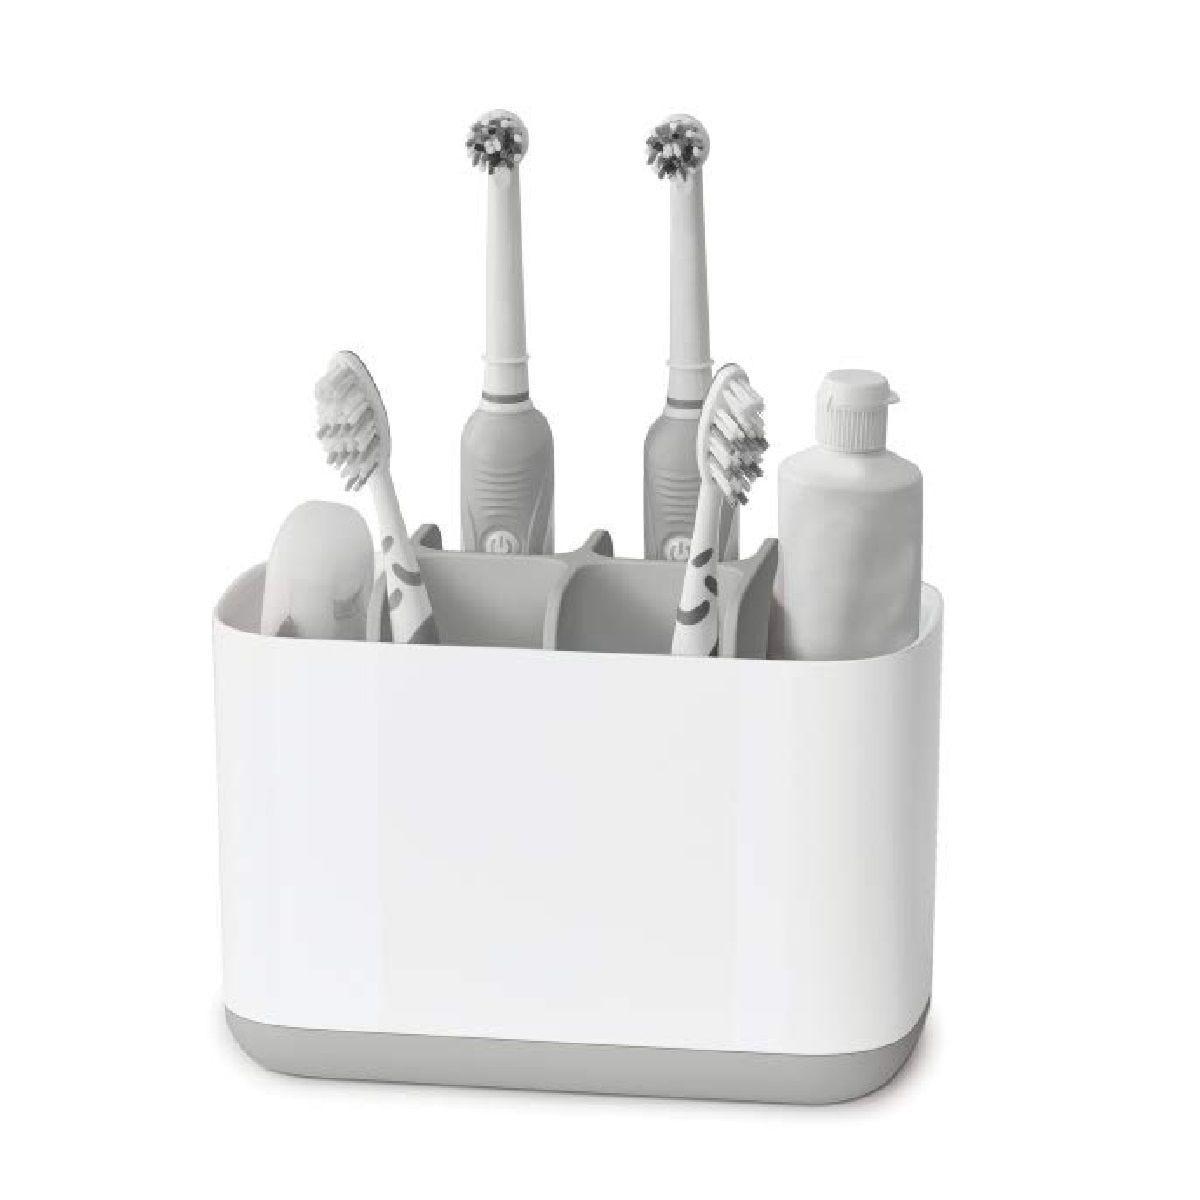 Joseph Joseph EasyStore Toothbrush Caddy Large - Grey/White